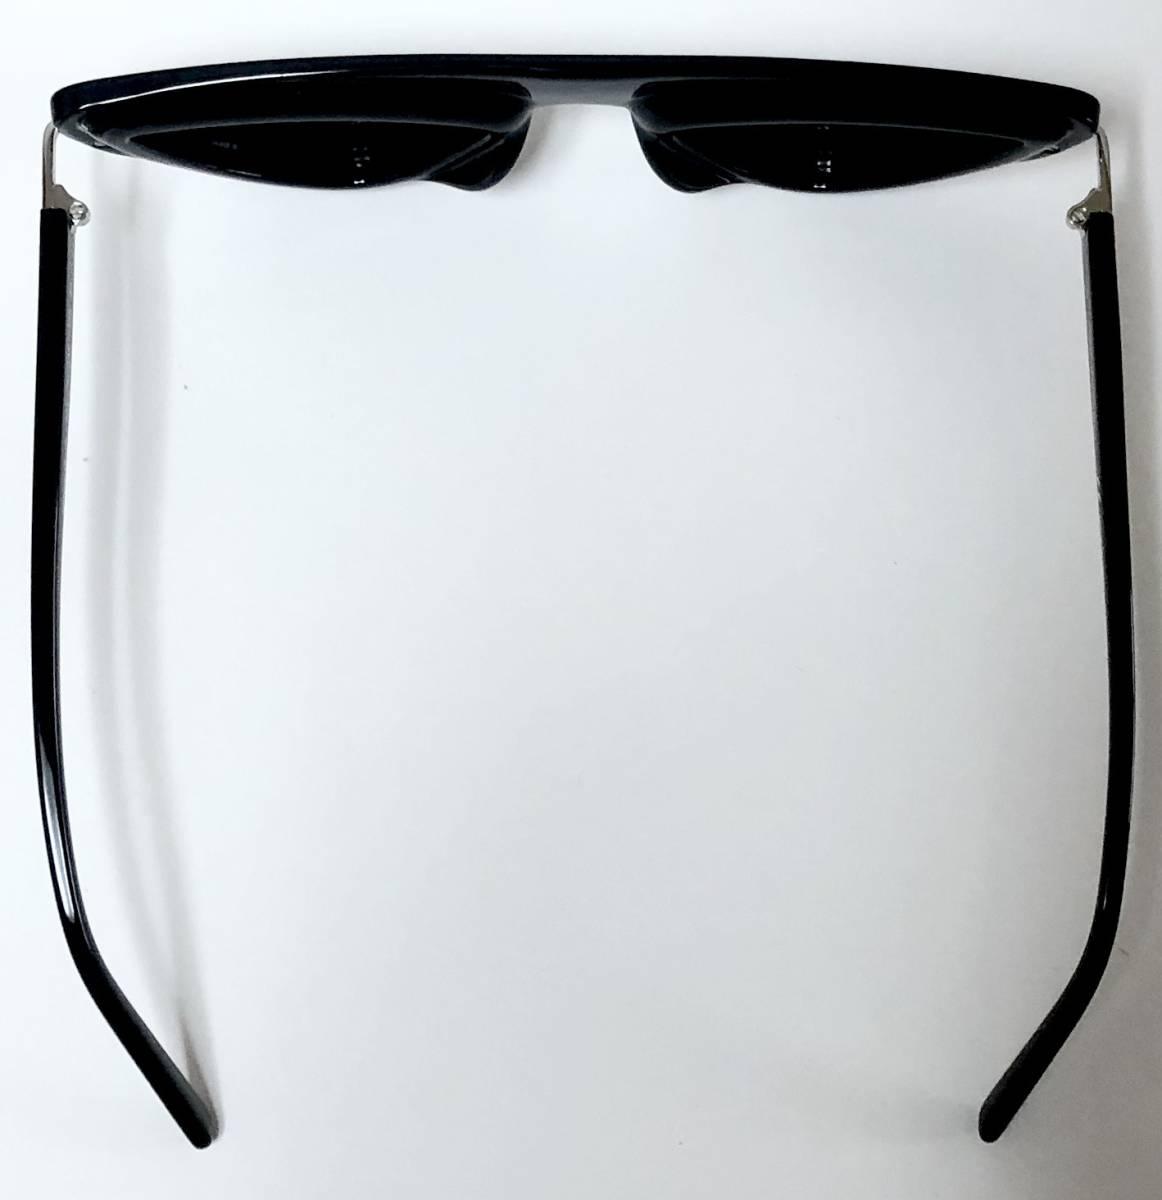 CK カルバンクライン 芸術的なサングラス イタリア製 純正・新品 ケース付き 米国ブランド Calvin Klein メガネ可能_画像8